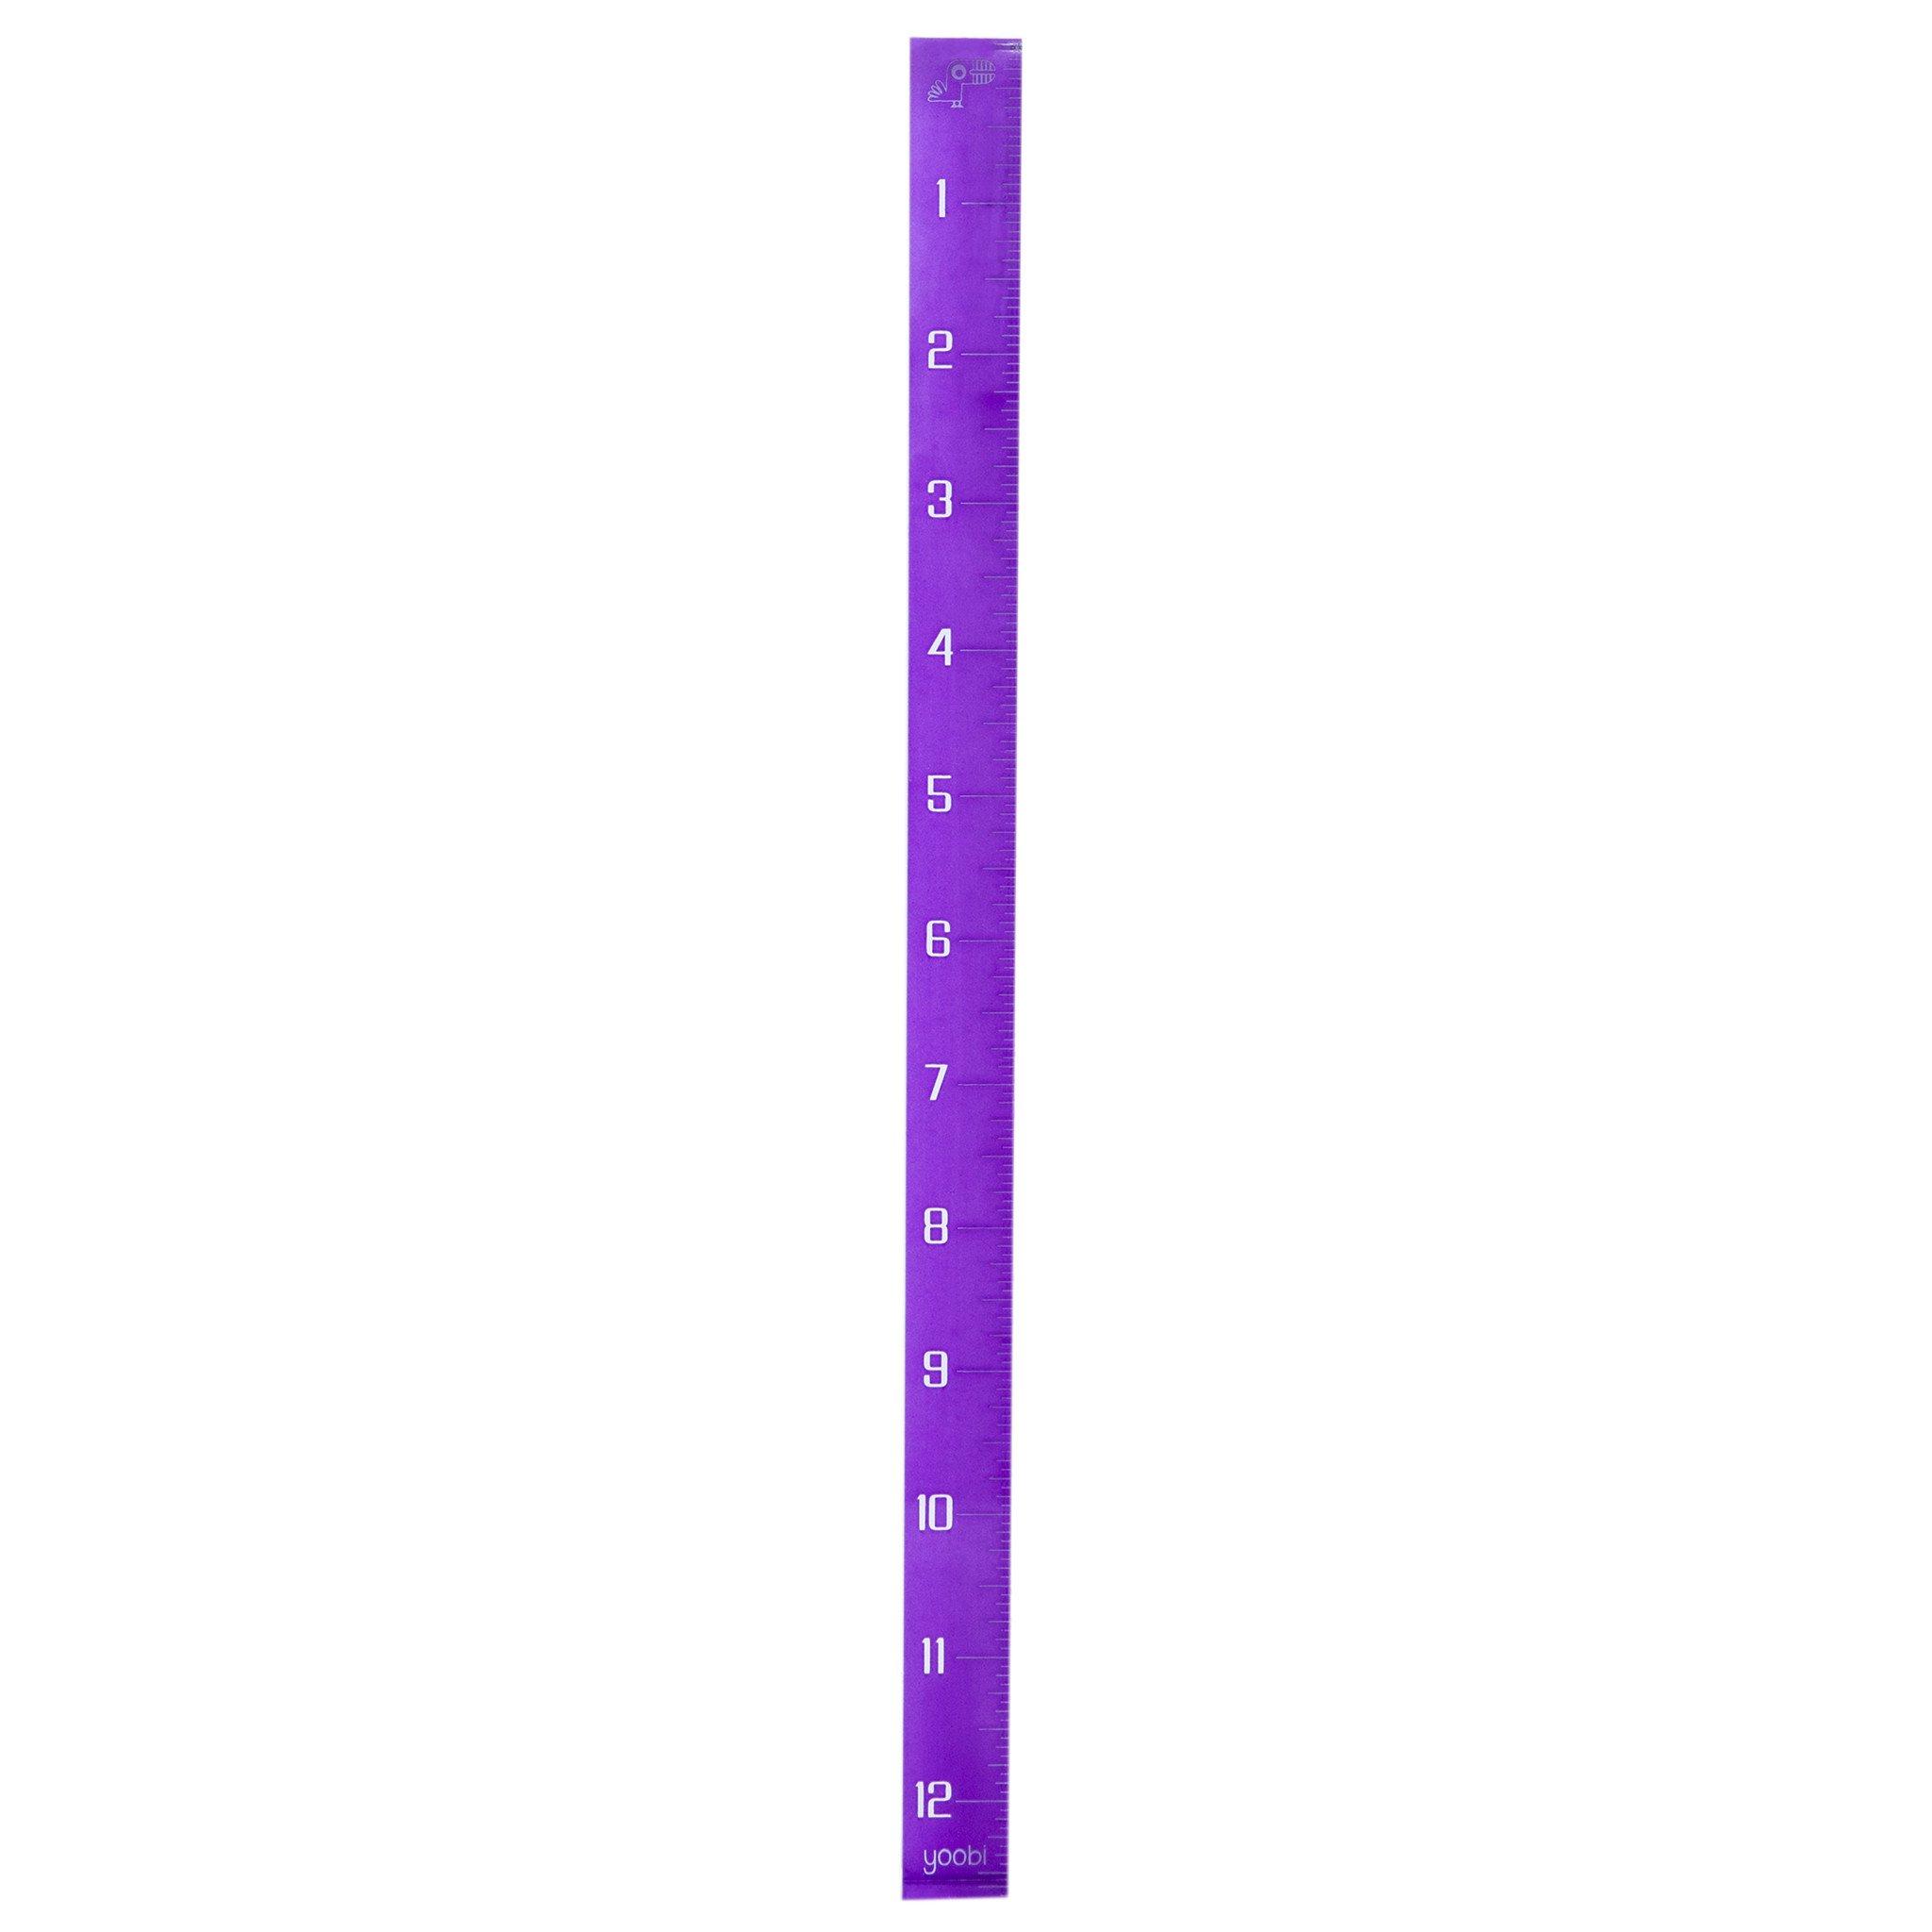 Yoobi Cubed Ruler - Purple